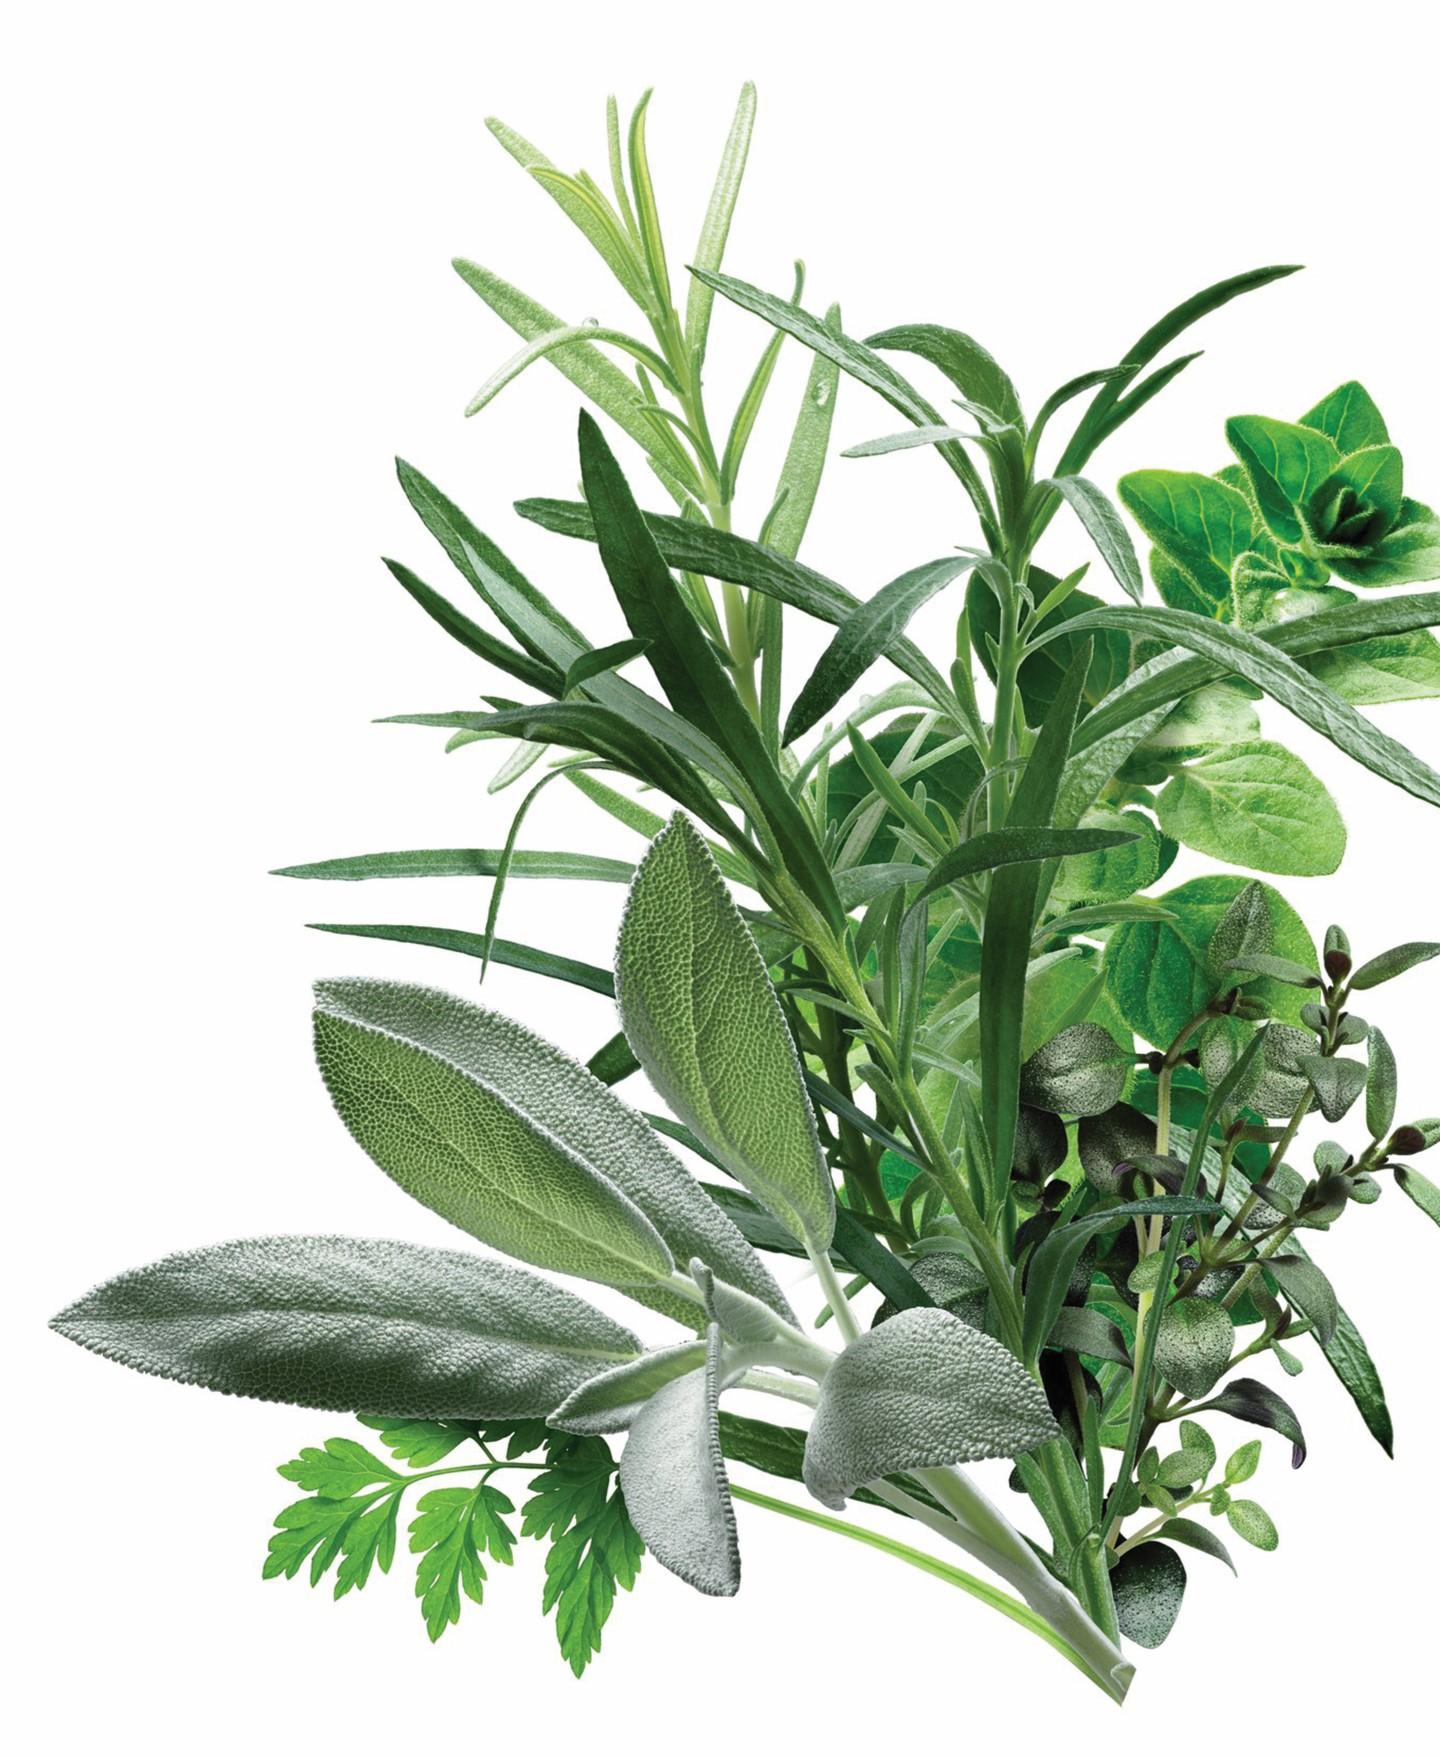 Herbal Medicine Services